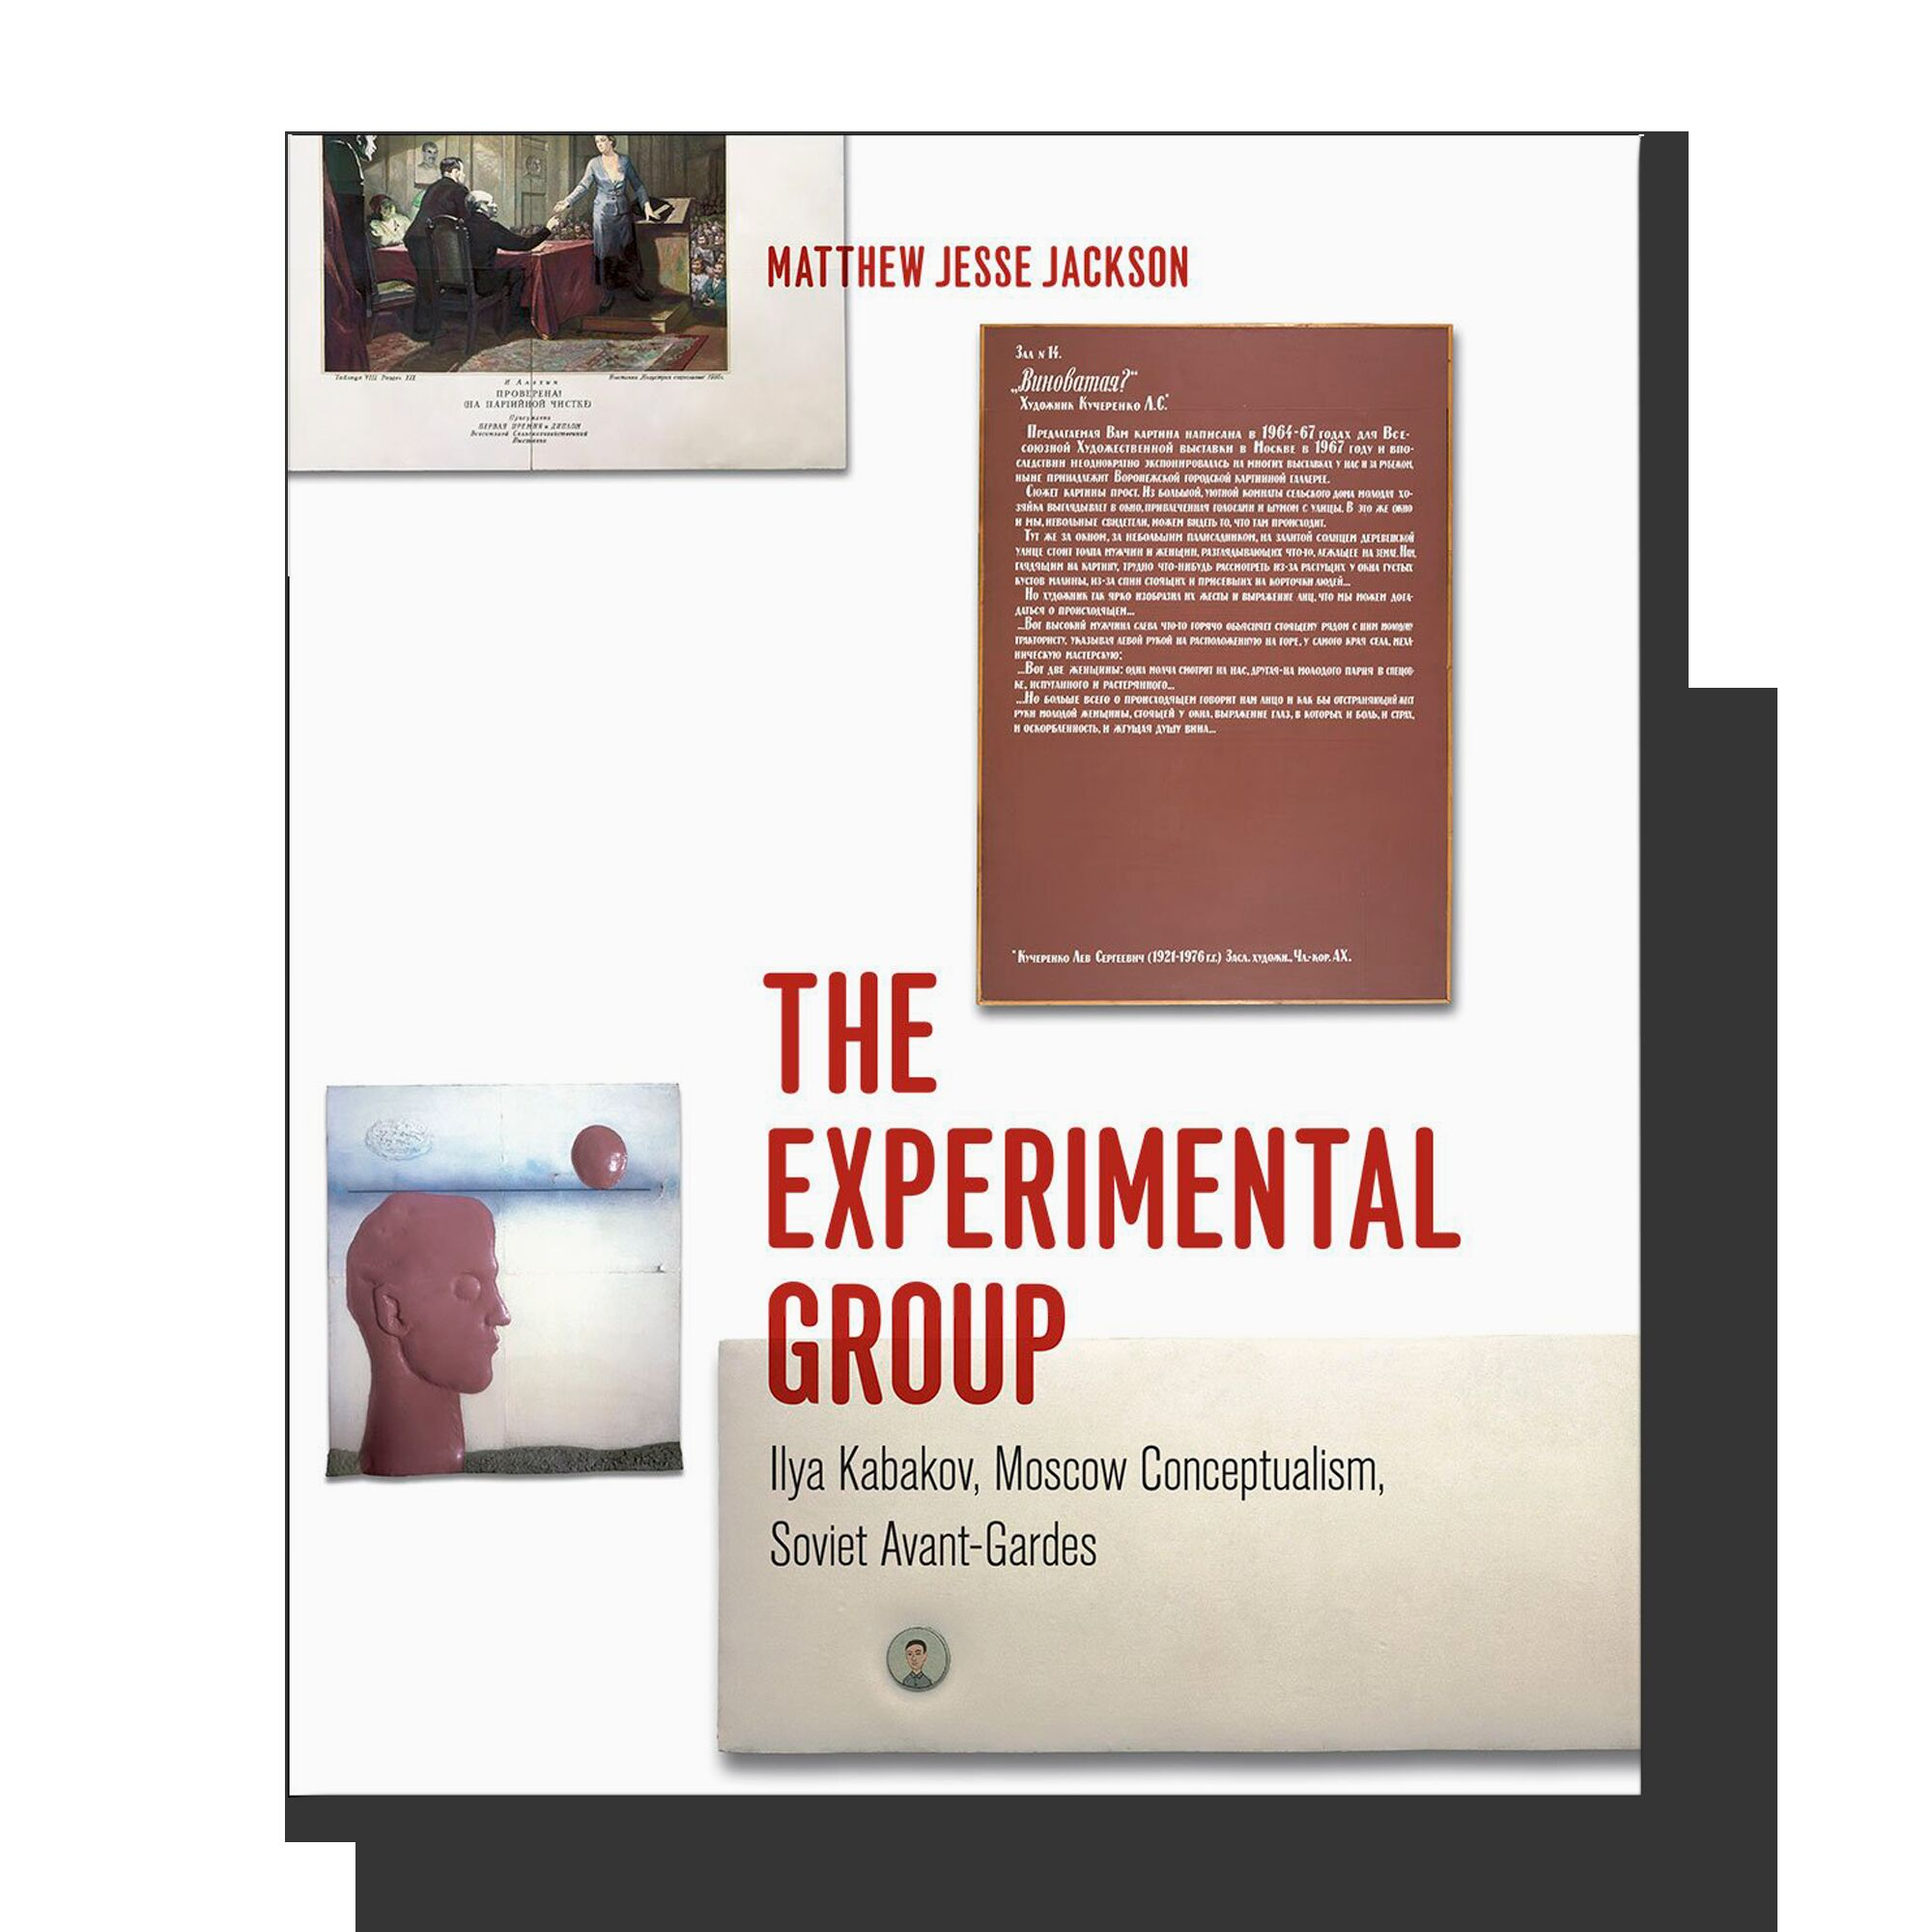 The Experimental Group: Ilya Kabakov, Moscow Conceptualism, Soviet Avant-Gardes